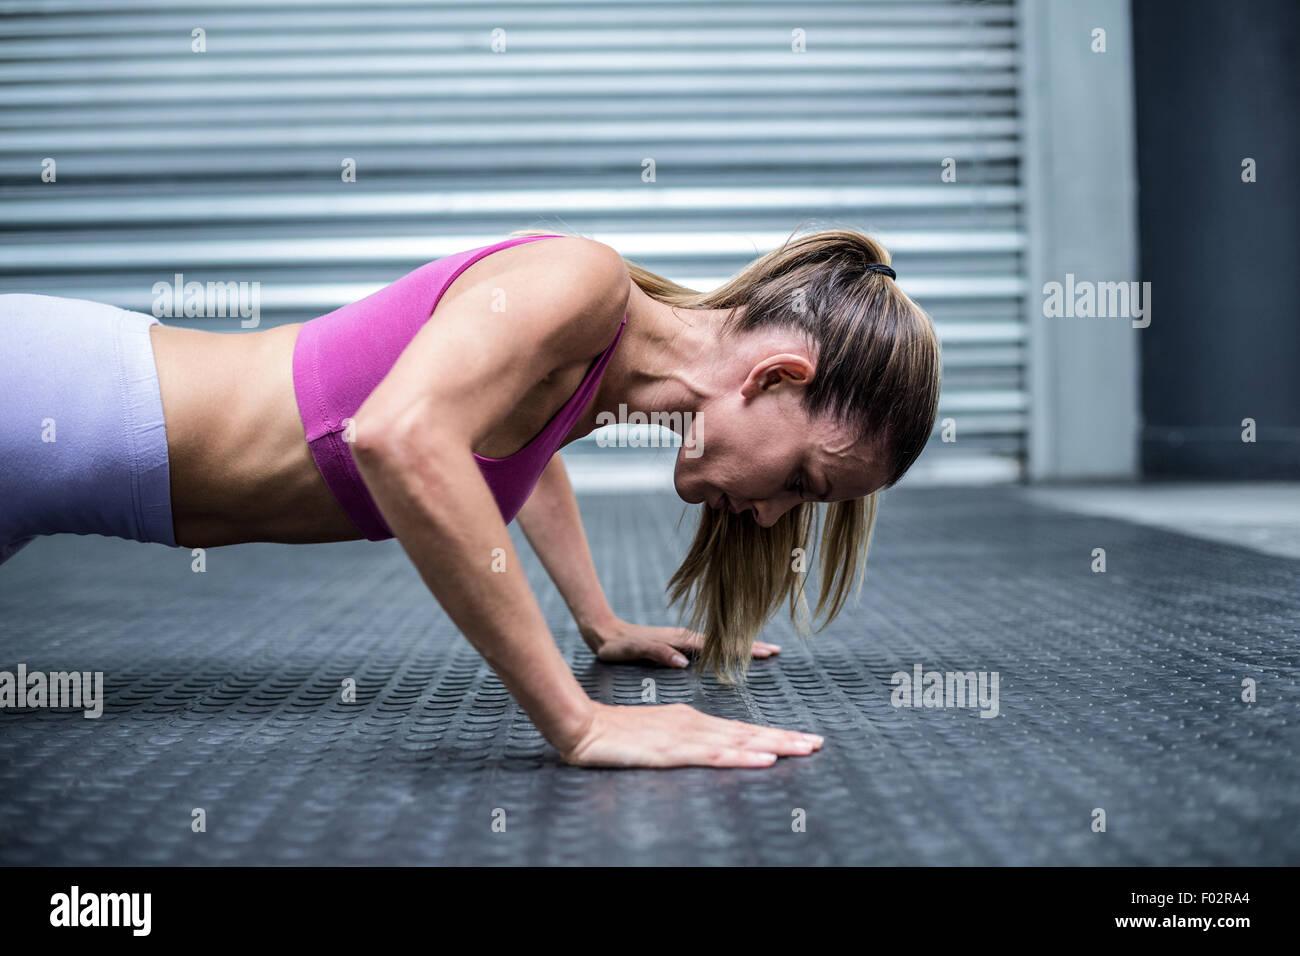 Muskulöse Frau tun Push Ups Stockbild